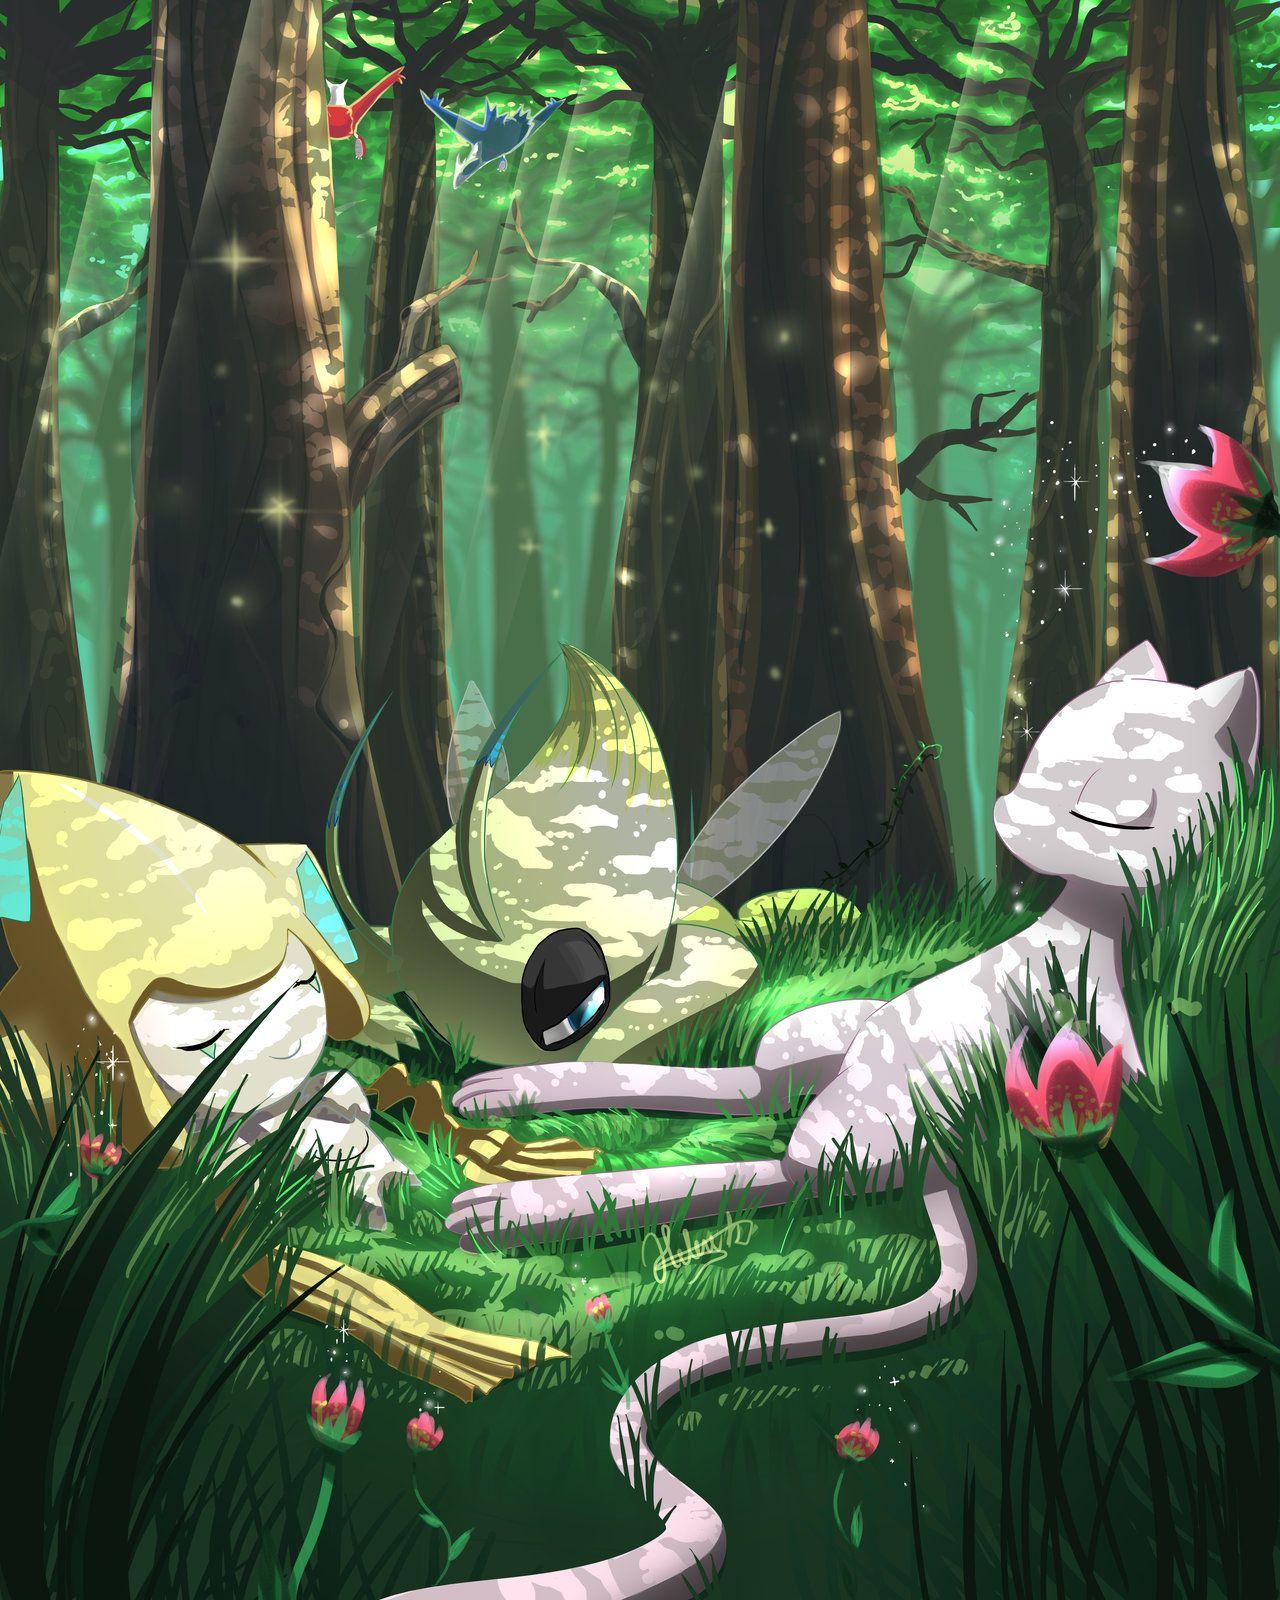 Tranquility Forest By Winter Wanderer On Deviantart Pokemon Mew Mythical Pokemon Pokemon